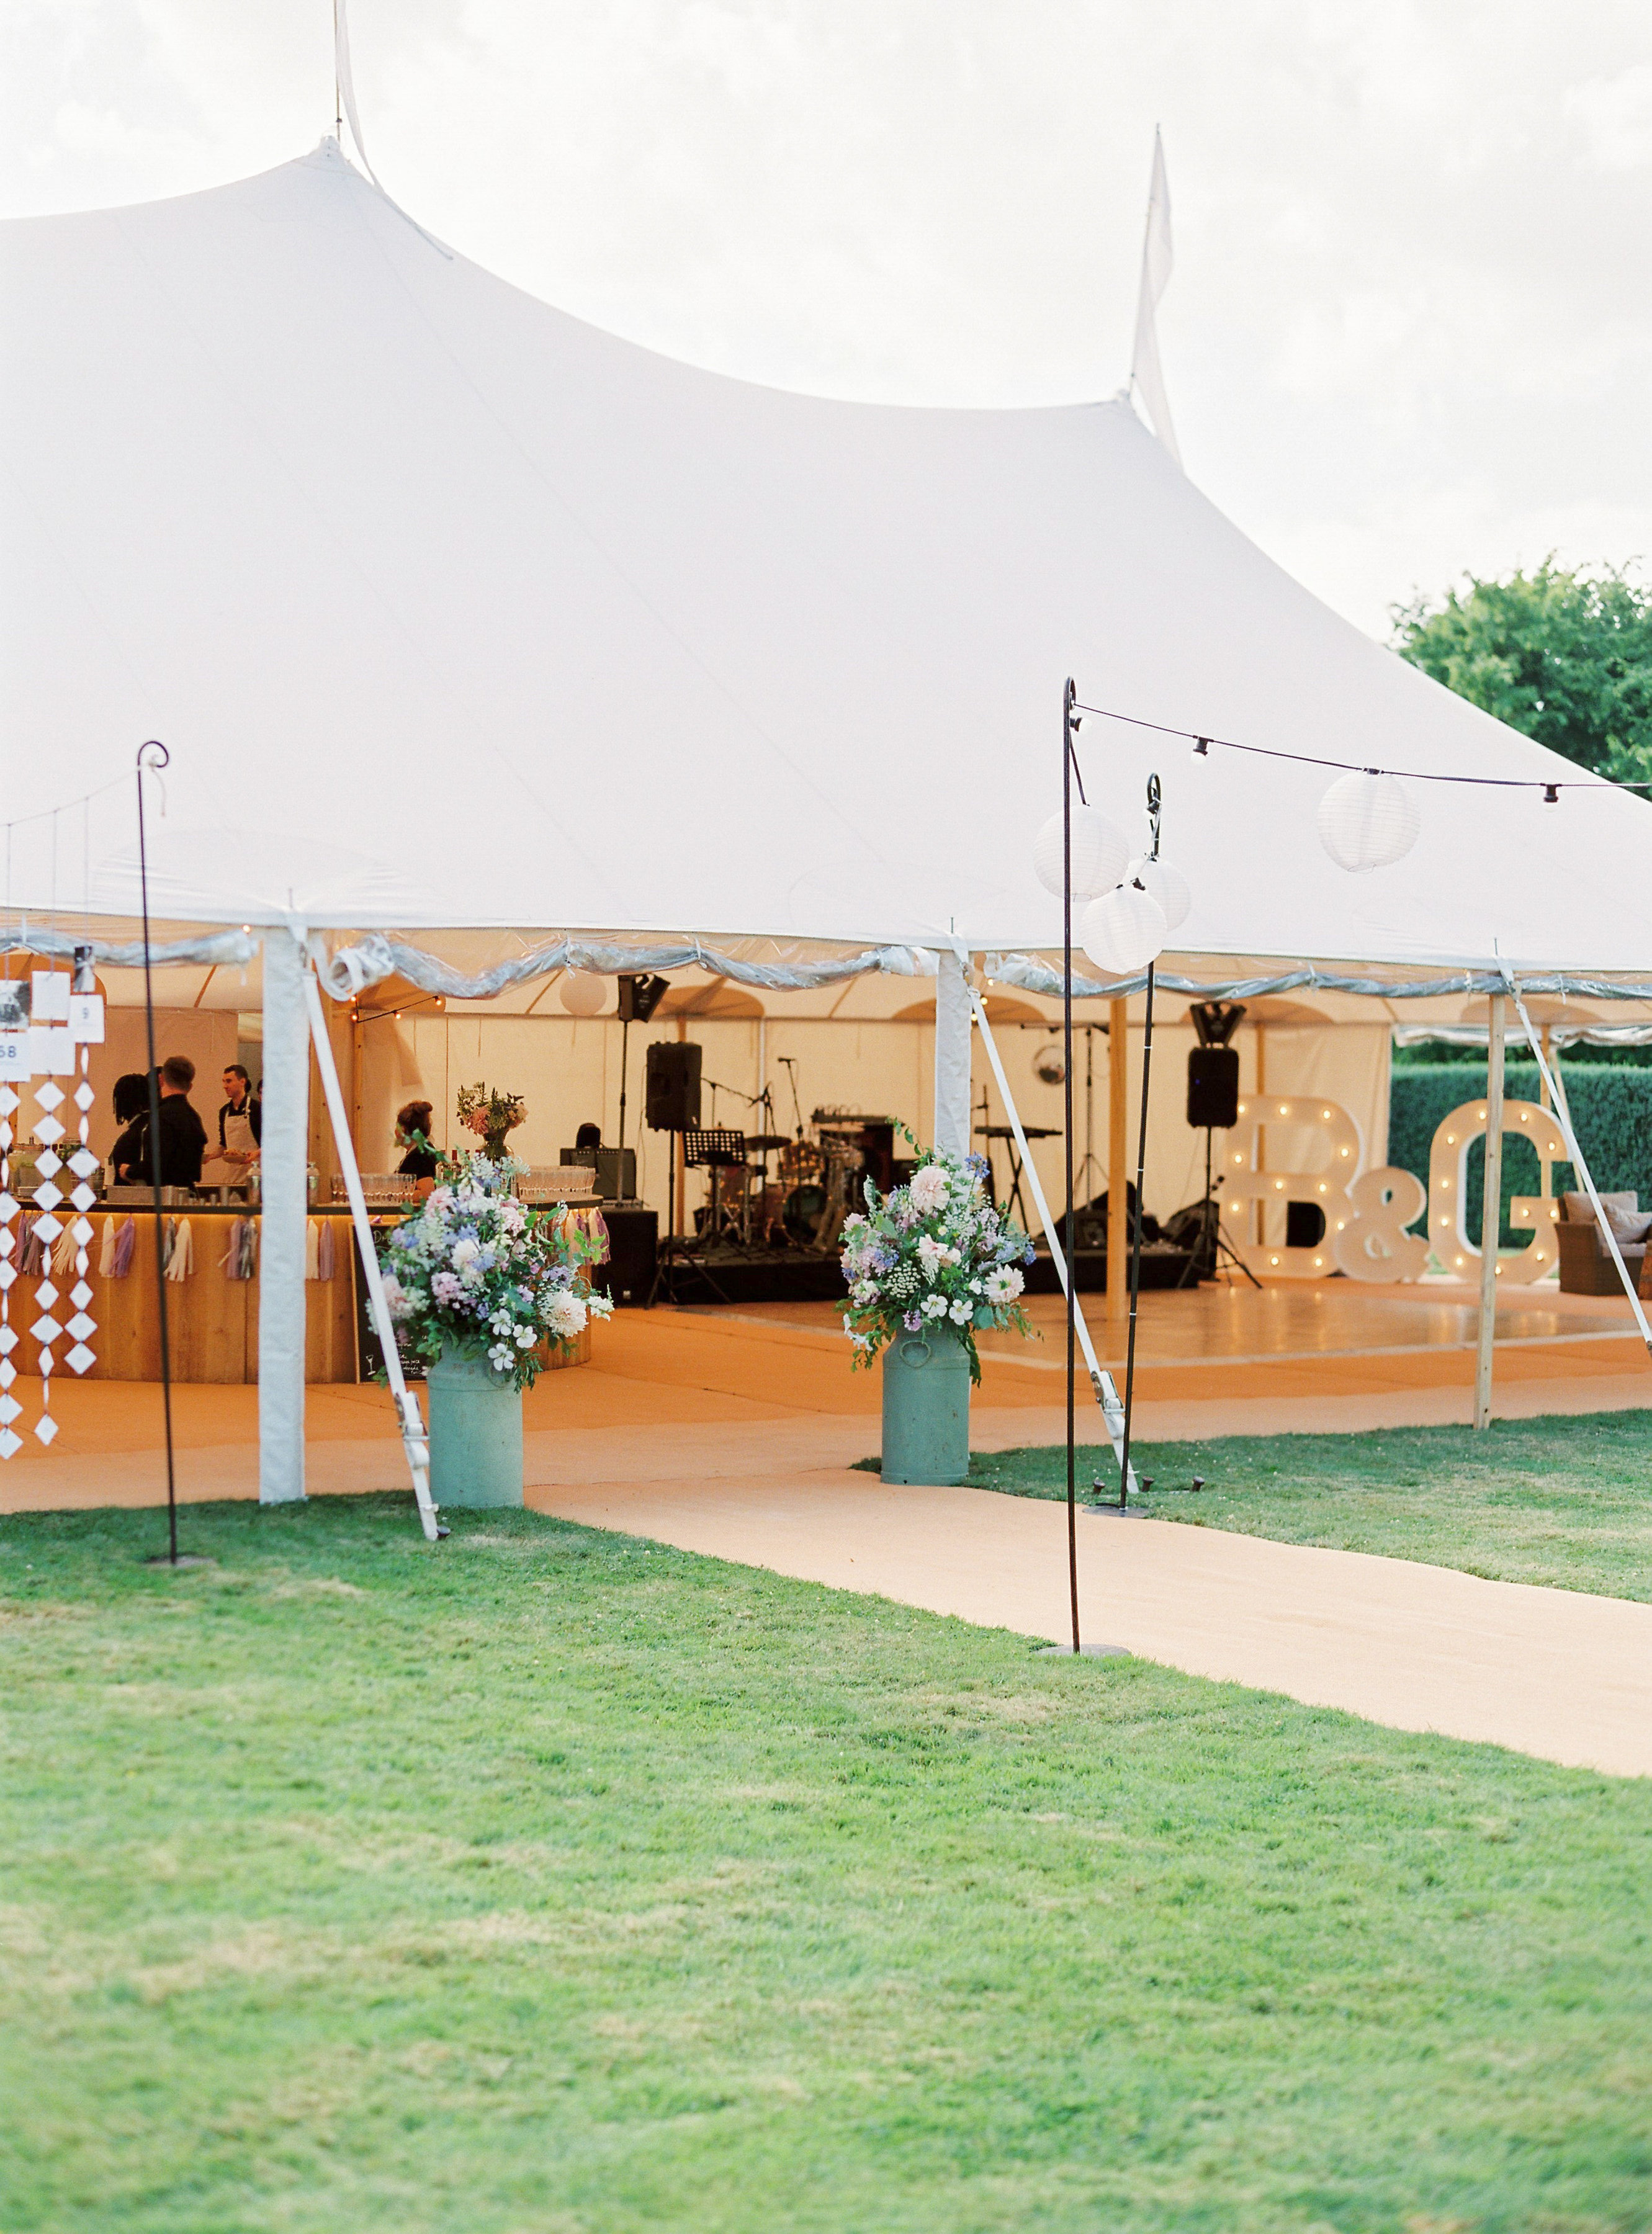 Georgie & Ben's PapaKåta Sperry Tent wedding at Newington House captured by Lucy Davenport: Festoon Walkway